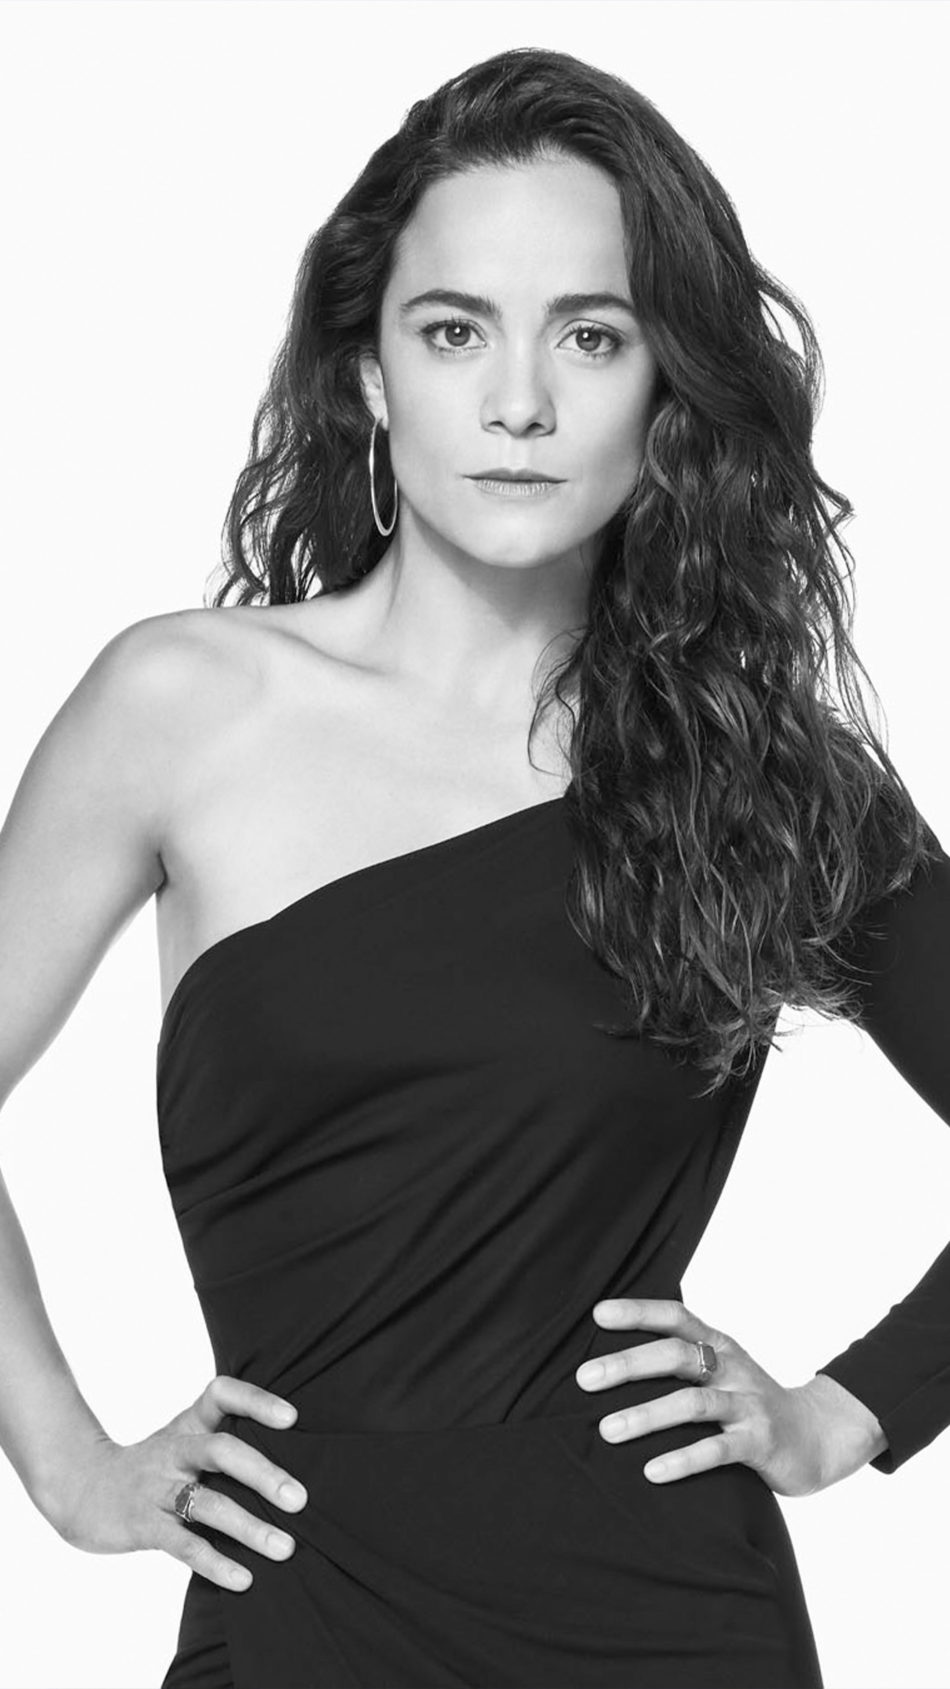 Brazilian Actress Alice Braga 2021 Black & White 4K Ultra HD Mobile Wallpaper